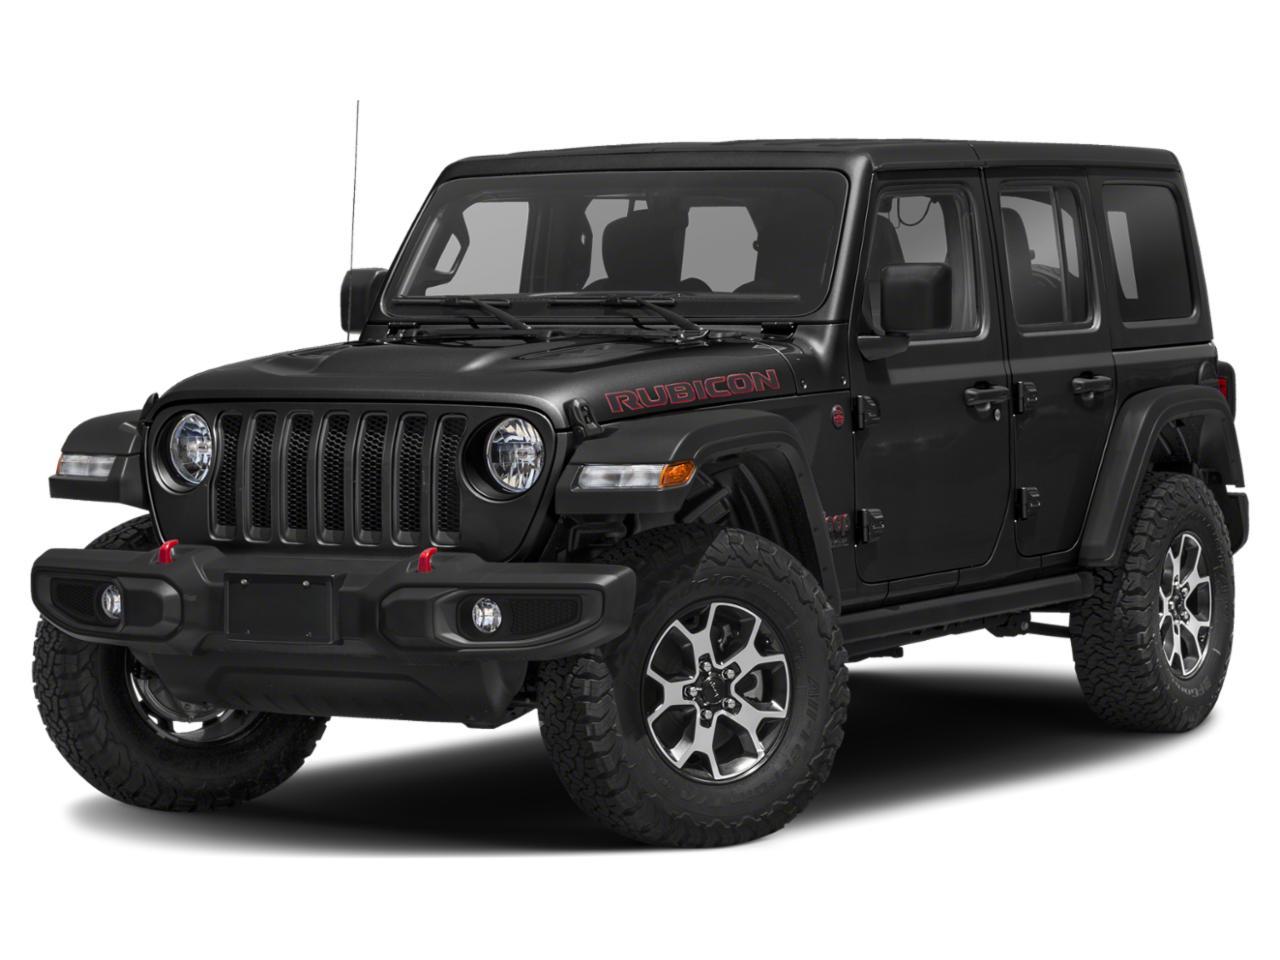 2020 Jeep Wrangler Unlimited Vehicle Photo in Corpus Christi, TX 78411